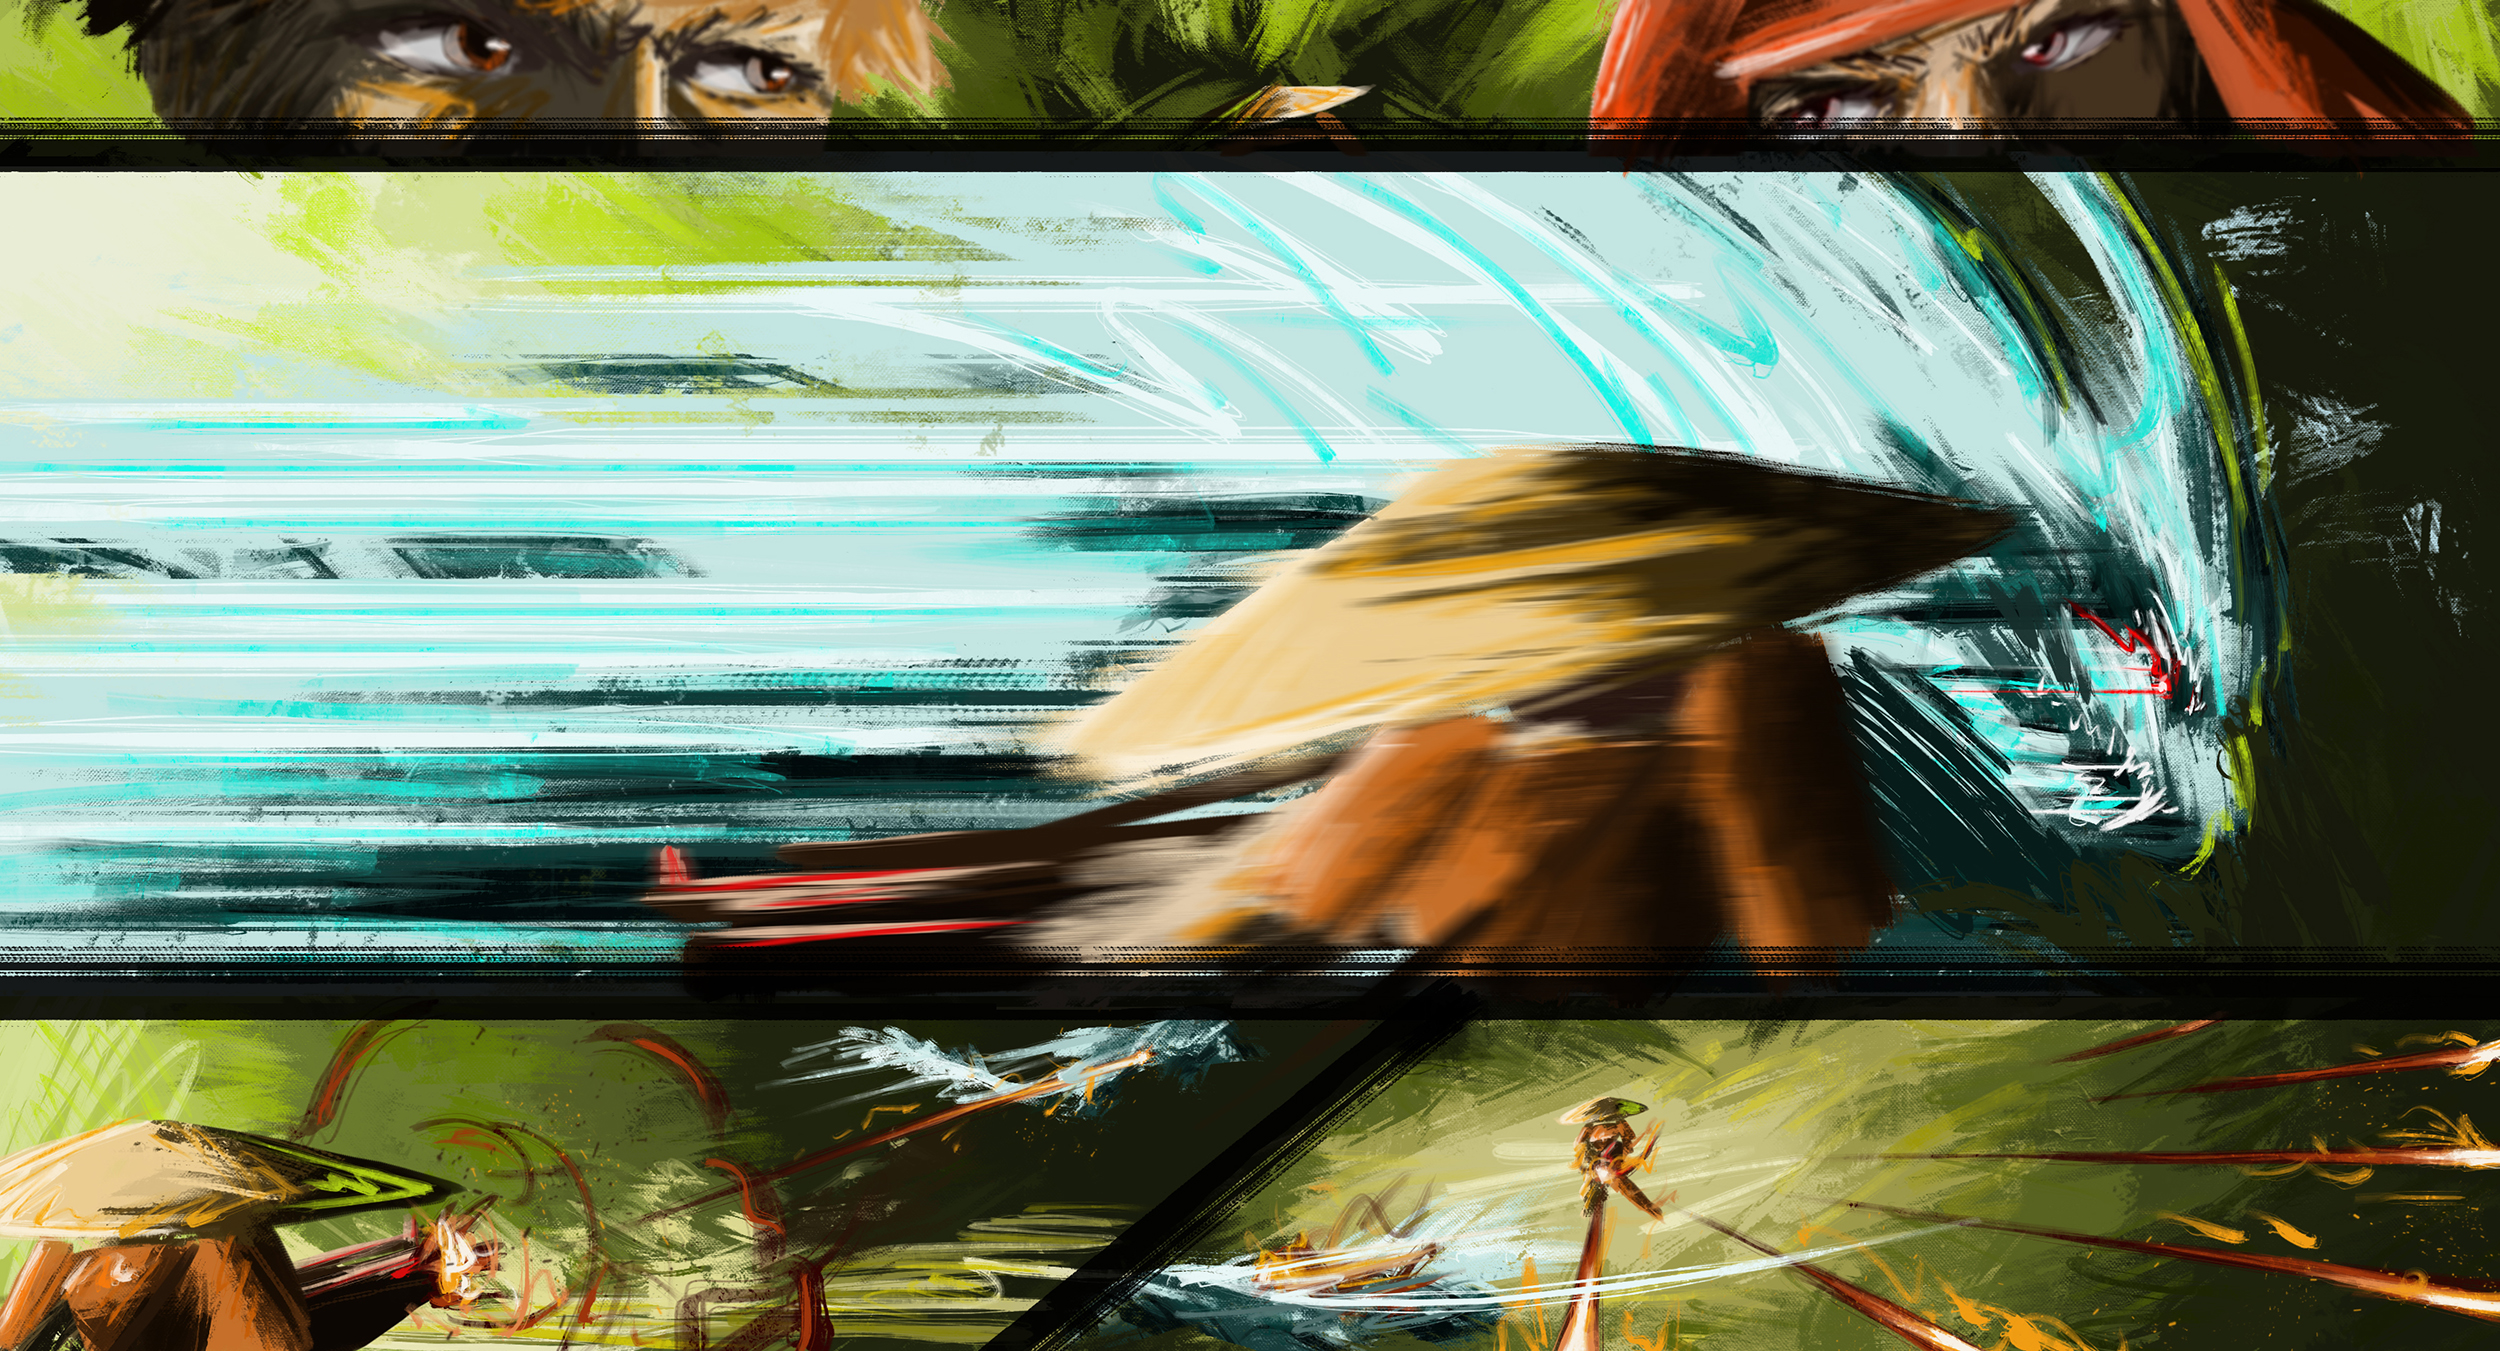 Attack - 03 - The pillar's Beast II